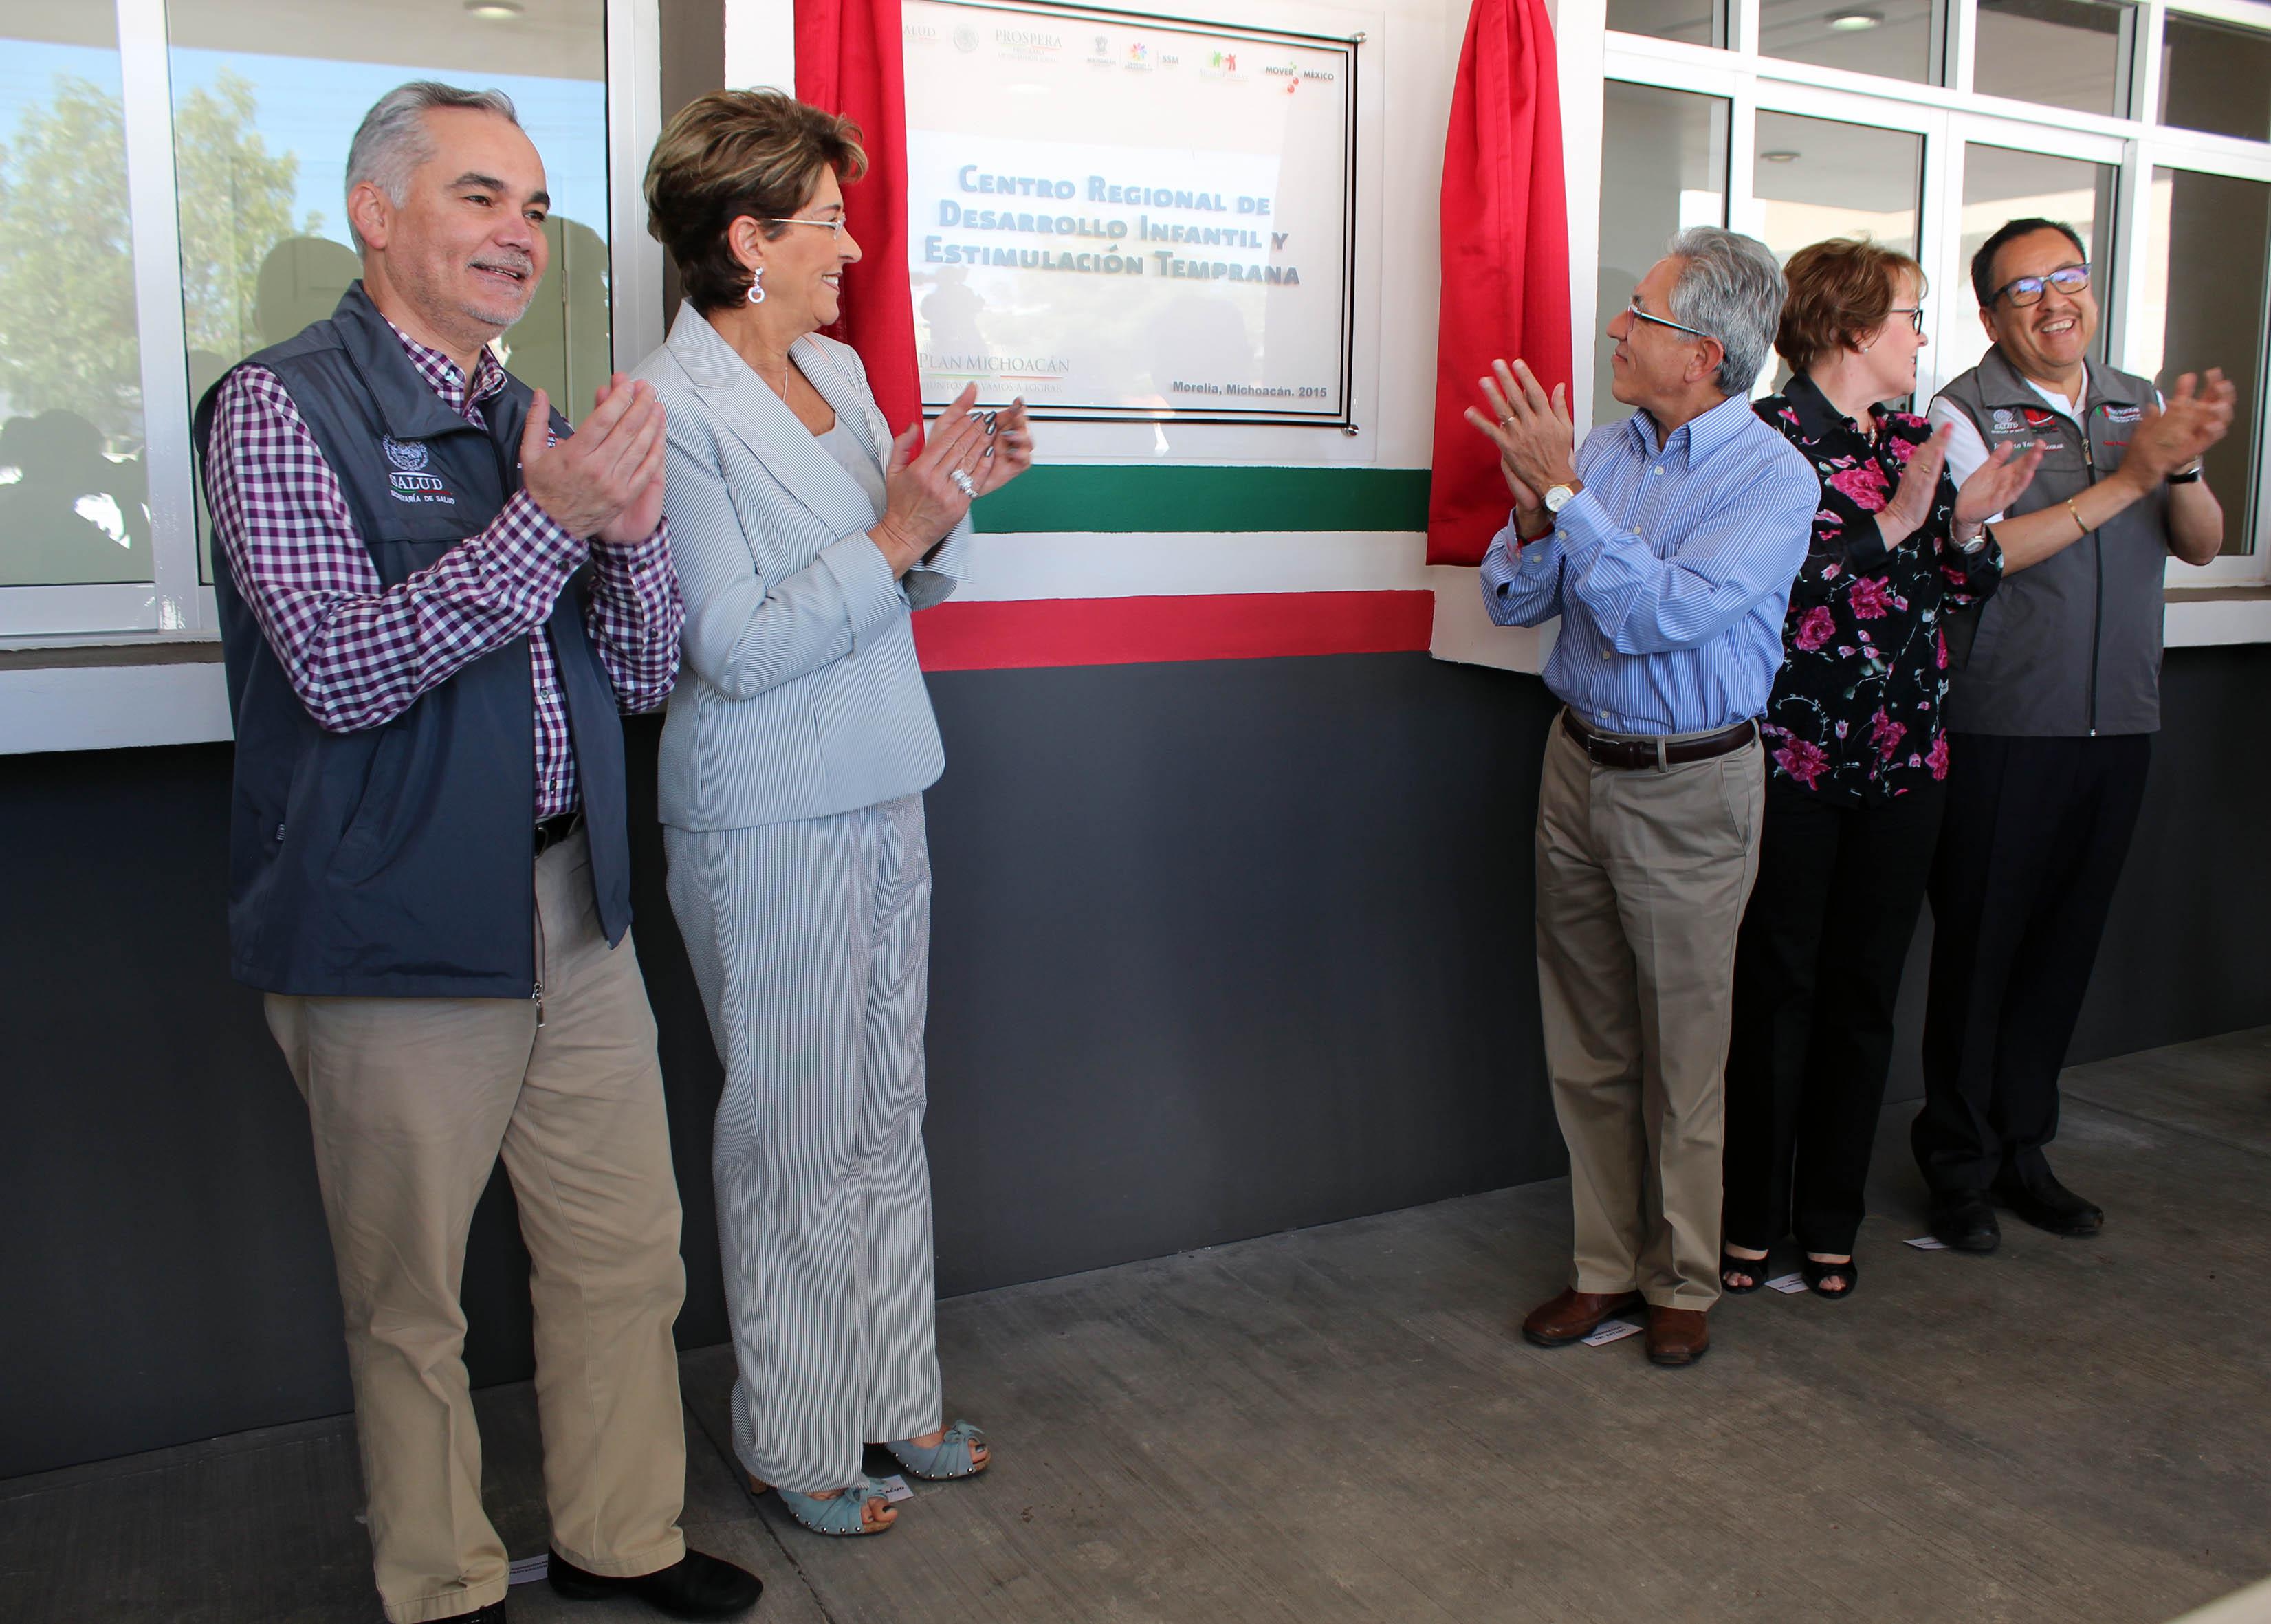 La Secretaria de Salud, Mercedes Juan, inauguró el Centro Regional de Desarrollo Infantil